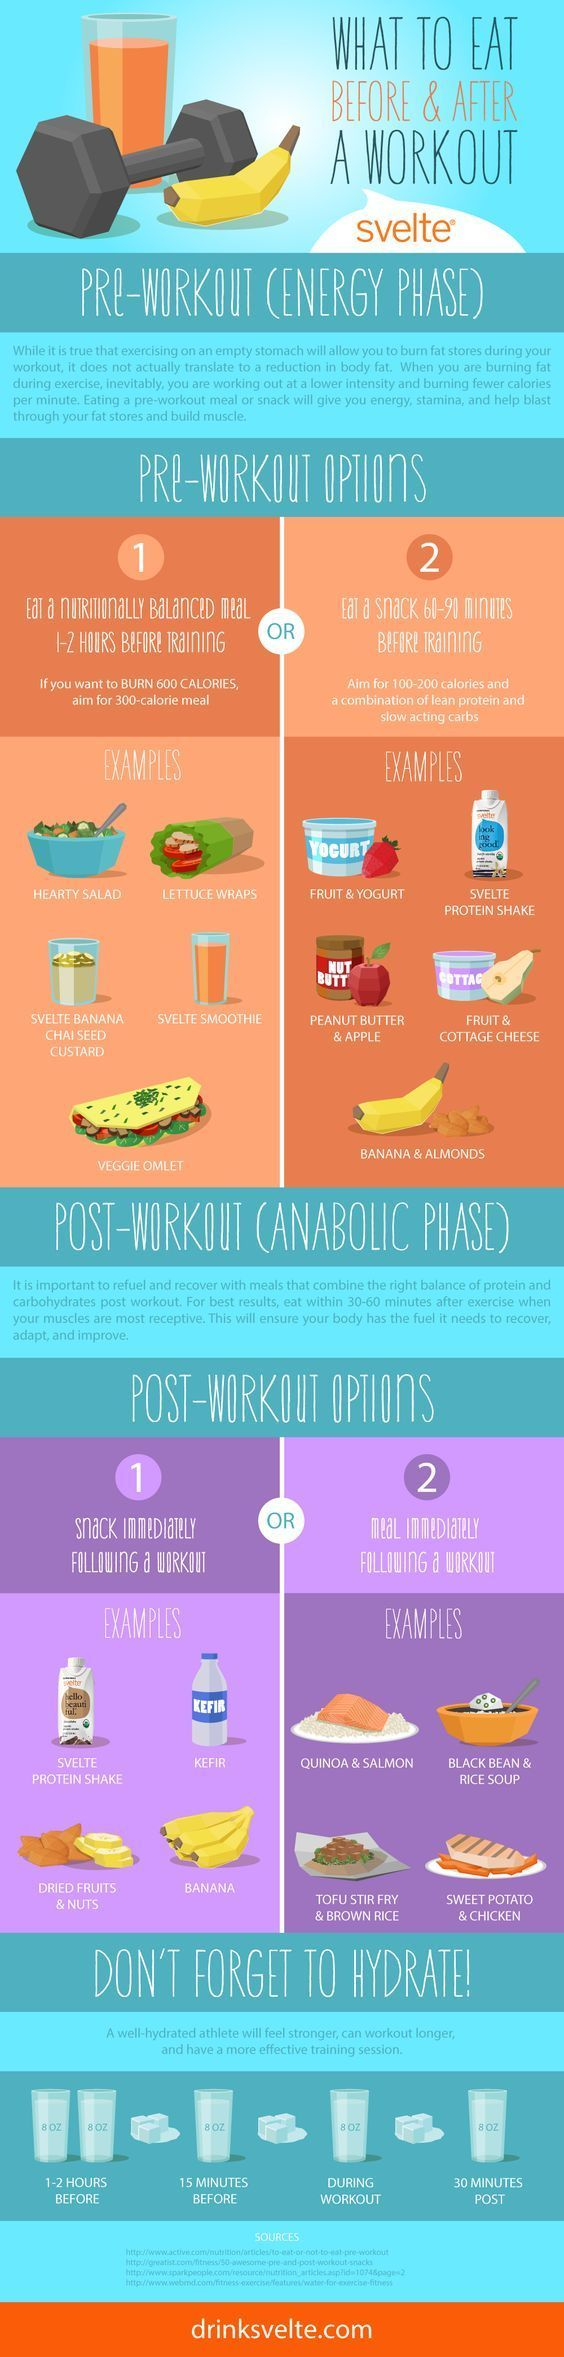 Does garcinia cambogia pills work